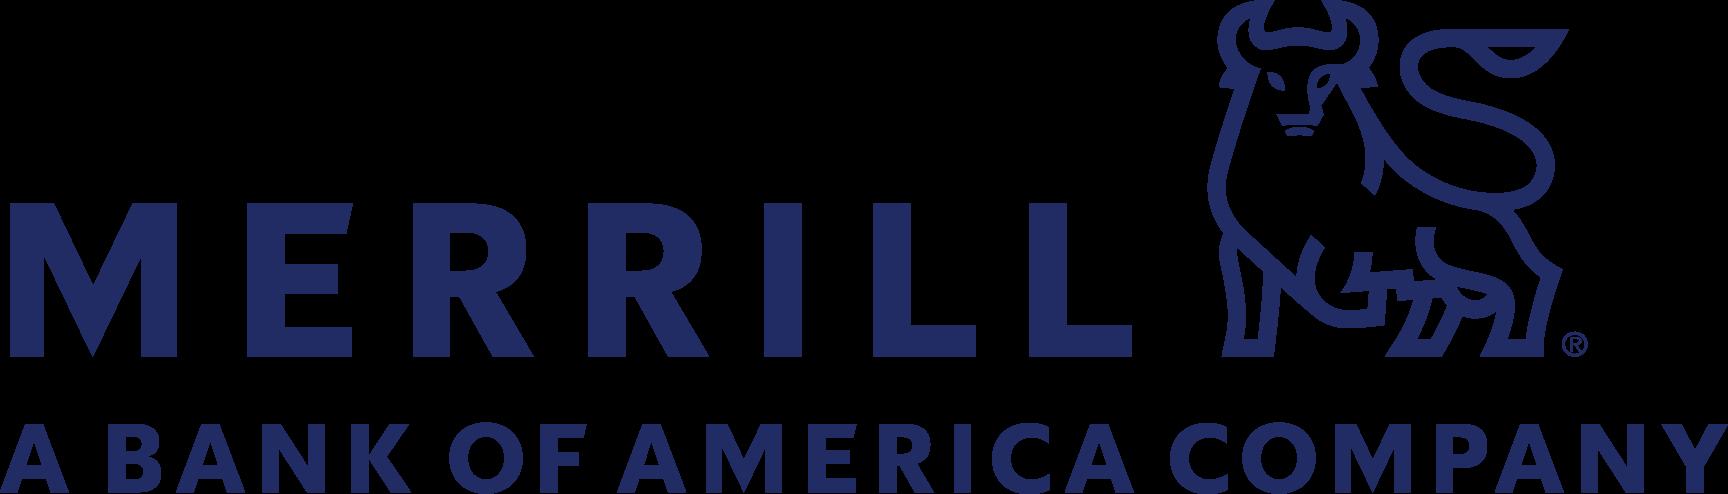 Merrill | A Bank of America Company